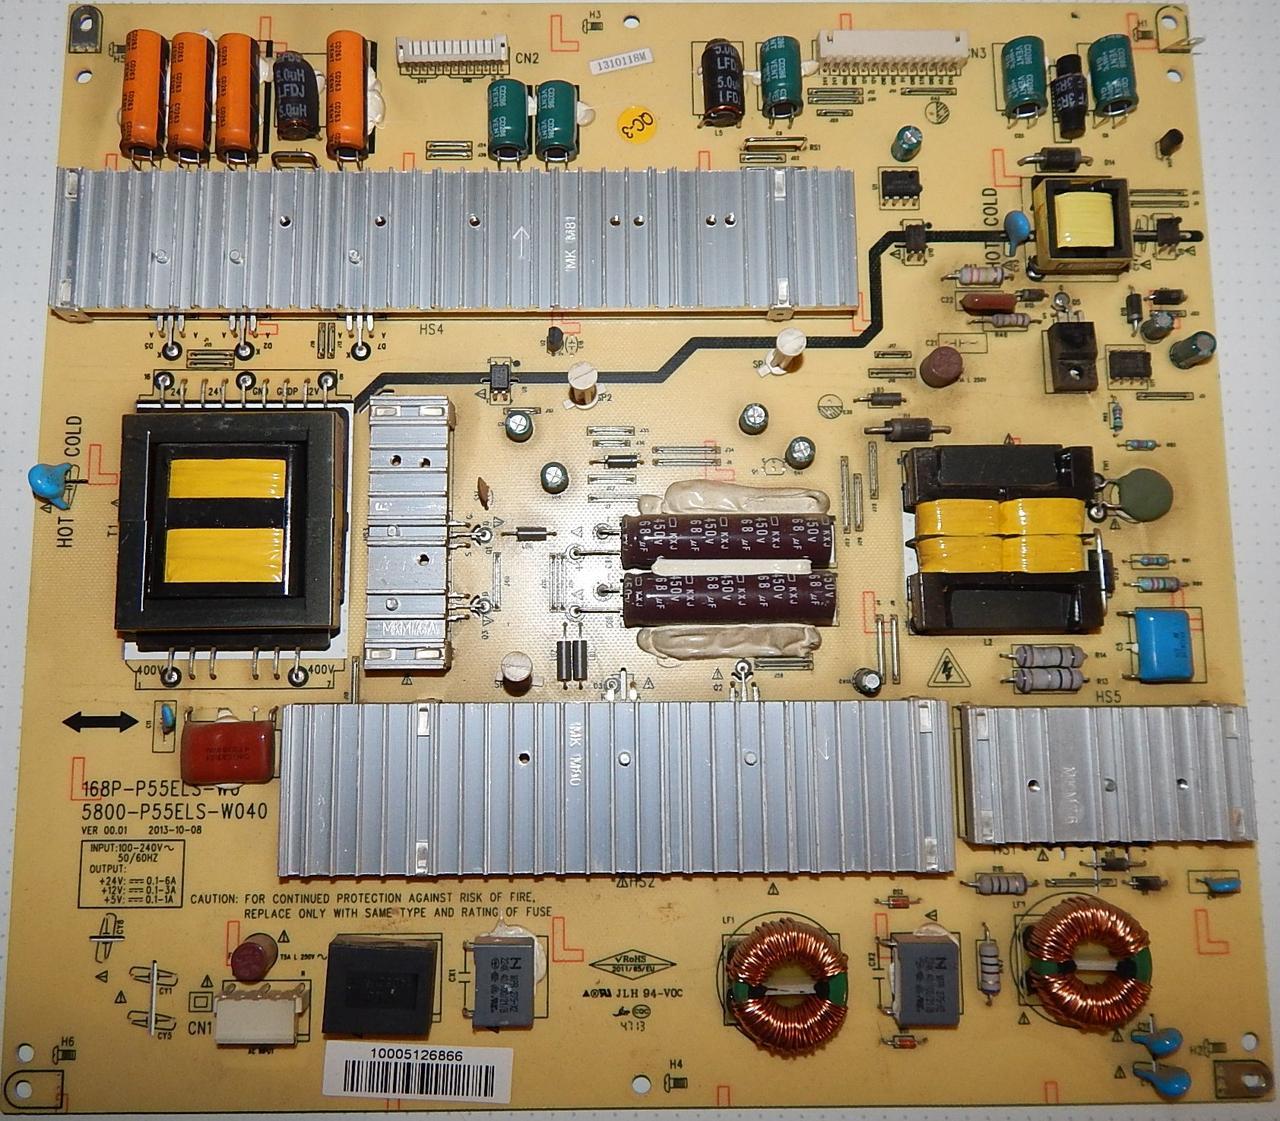 Блок питание 5800-P55ELS-W040 к телевизору Pioner piate pie 32fmn2